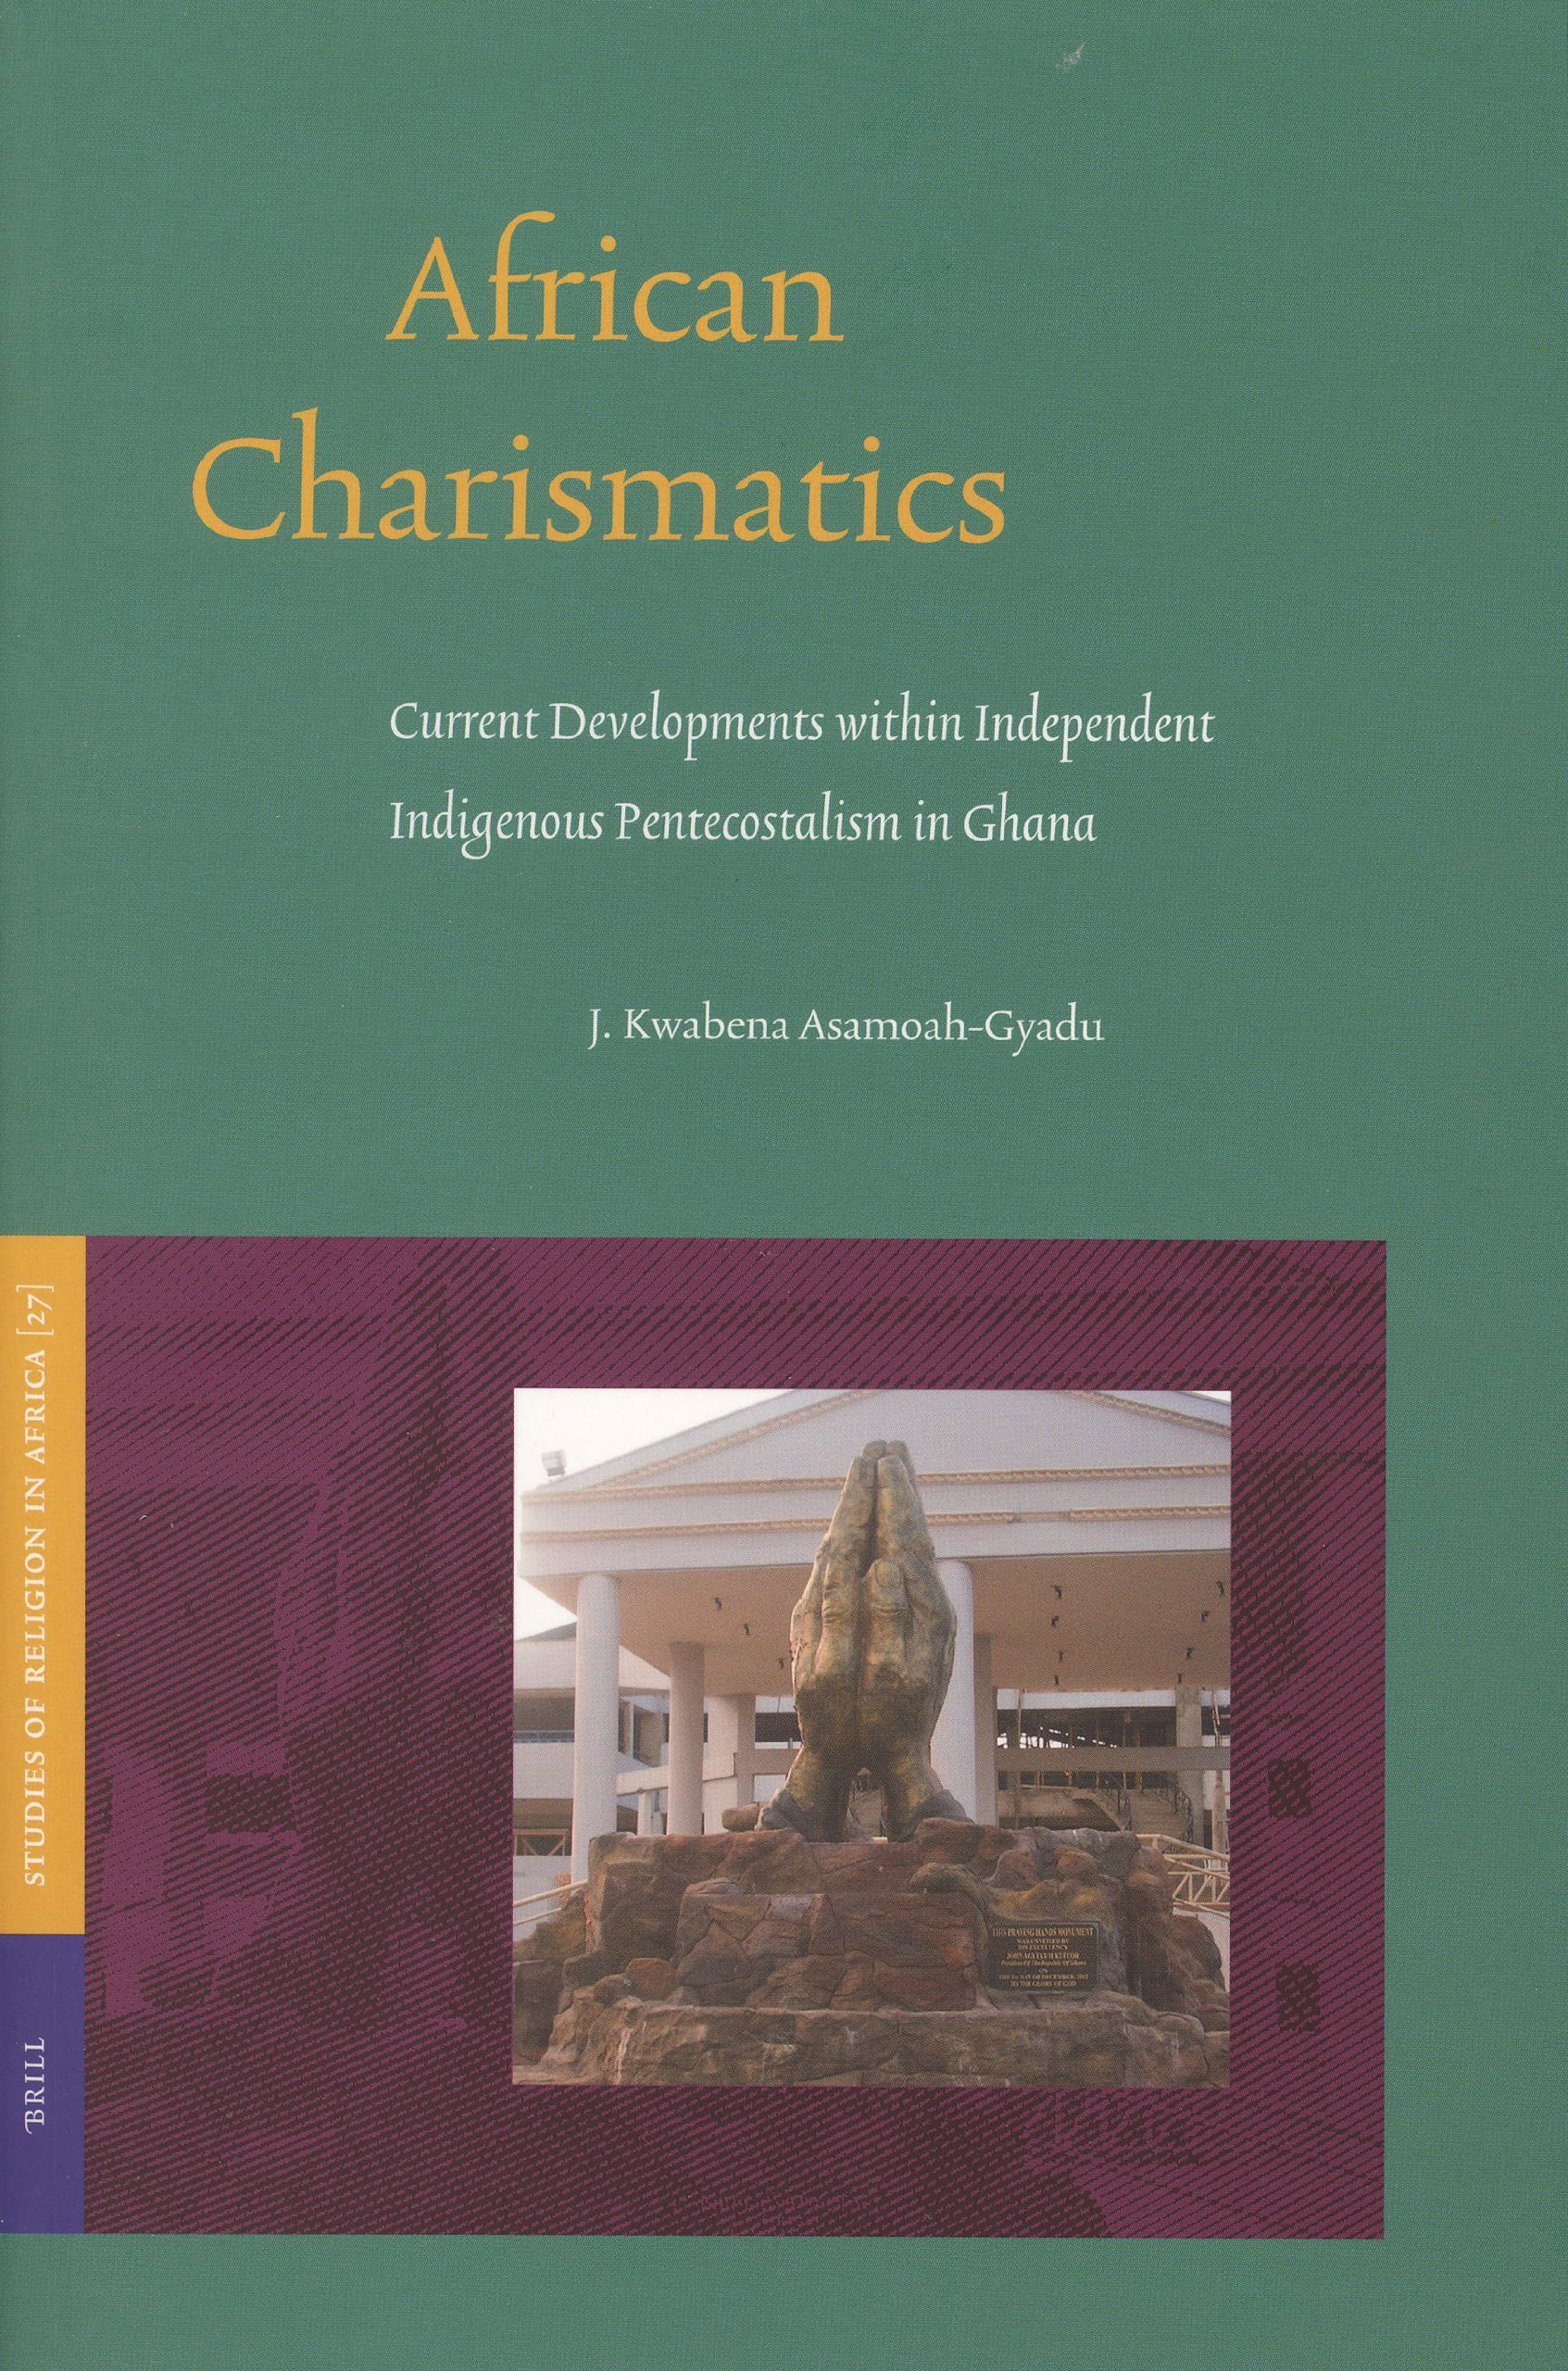 African Charismatics: Current Developments Within Independent Indigenous Pentecostalism in Ghana (Studies of Religion in Africa) ebook